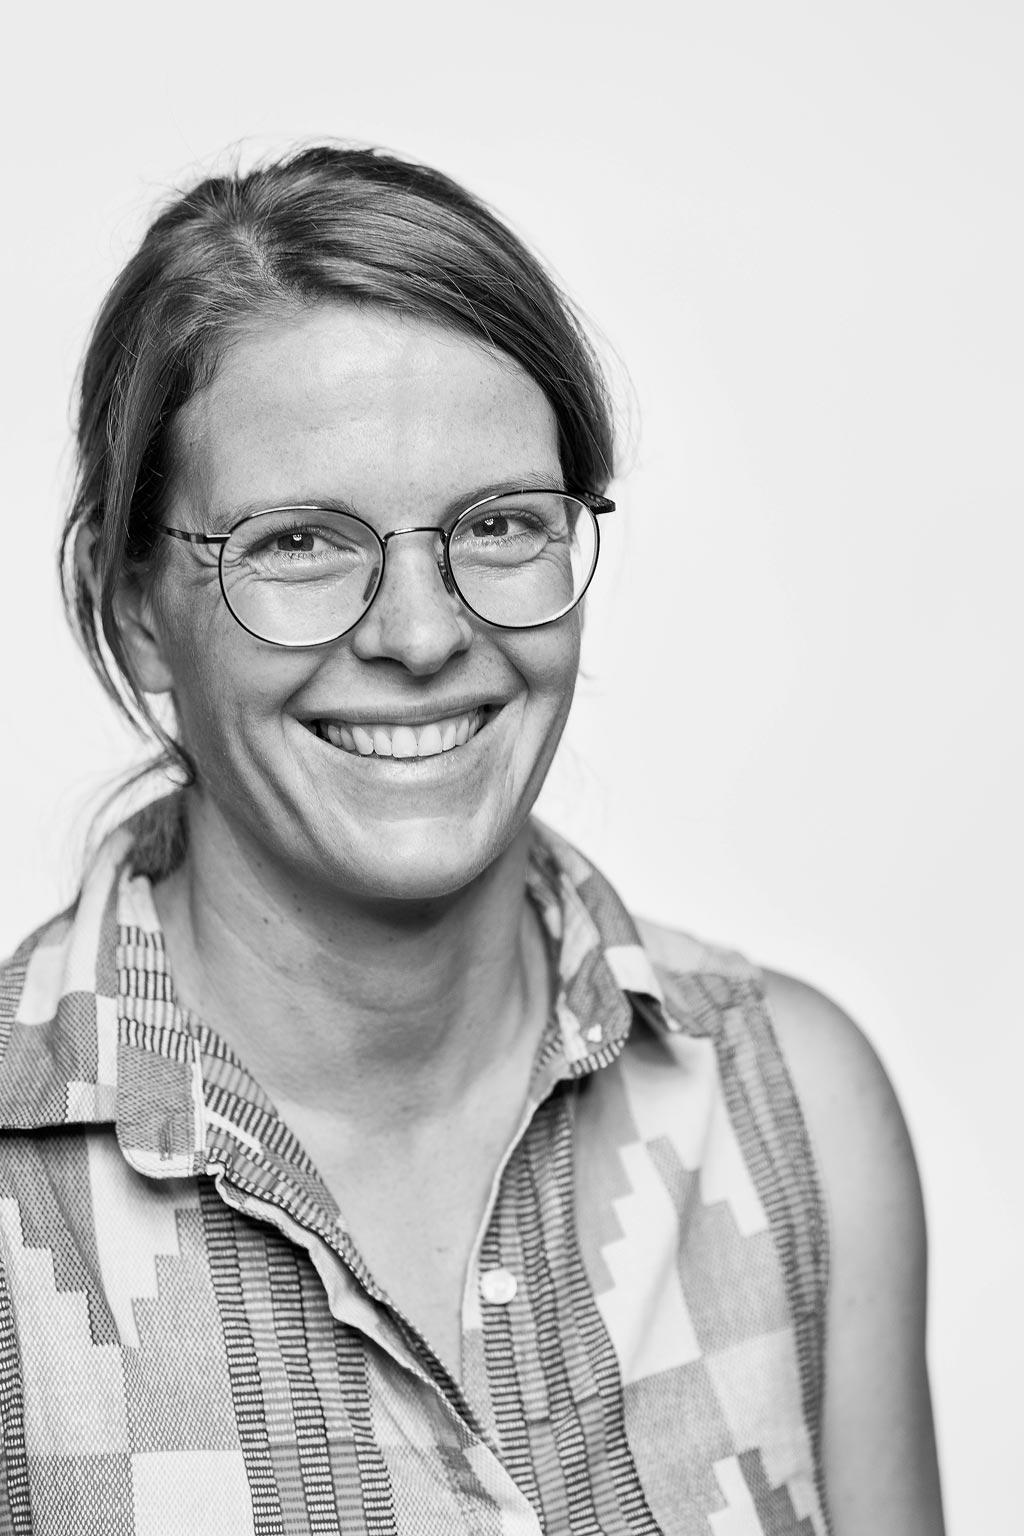 Portraitaktion Altona macht auf © Hermann Jansen